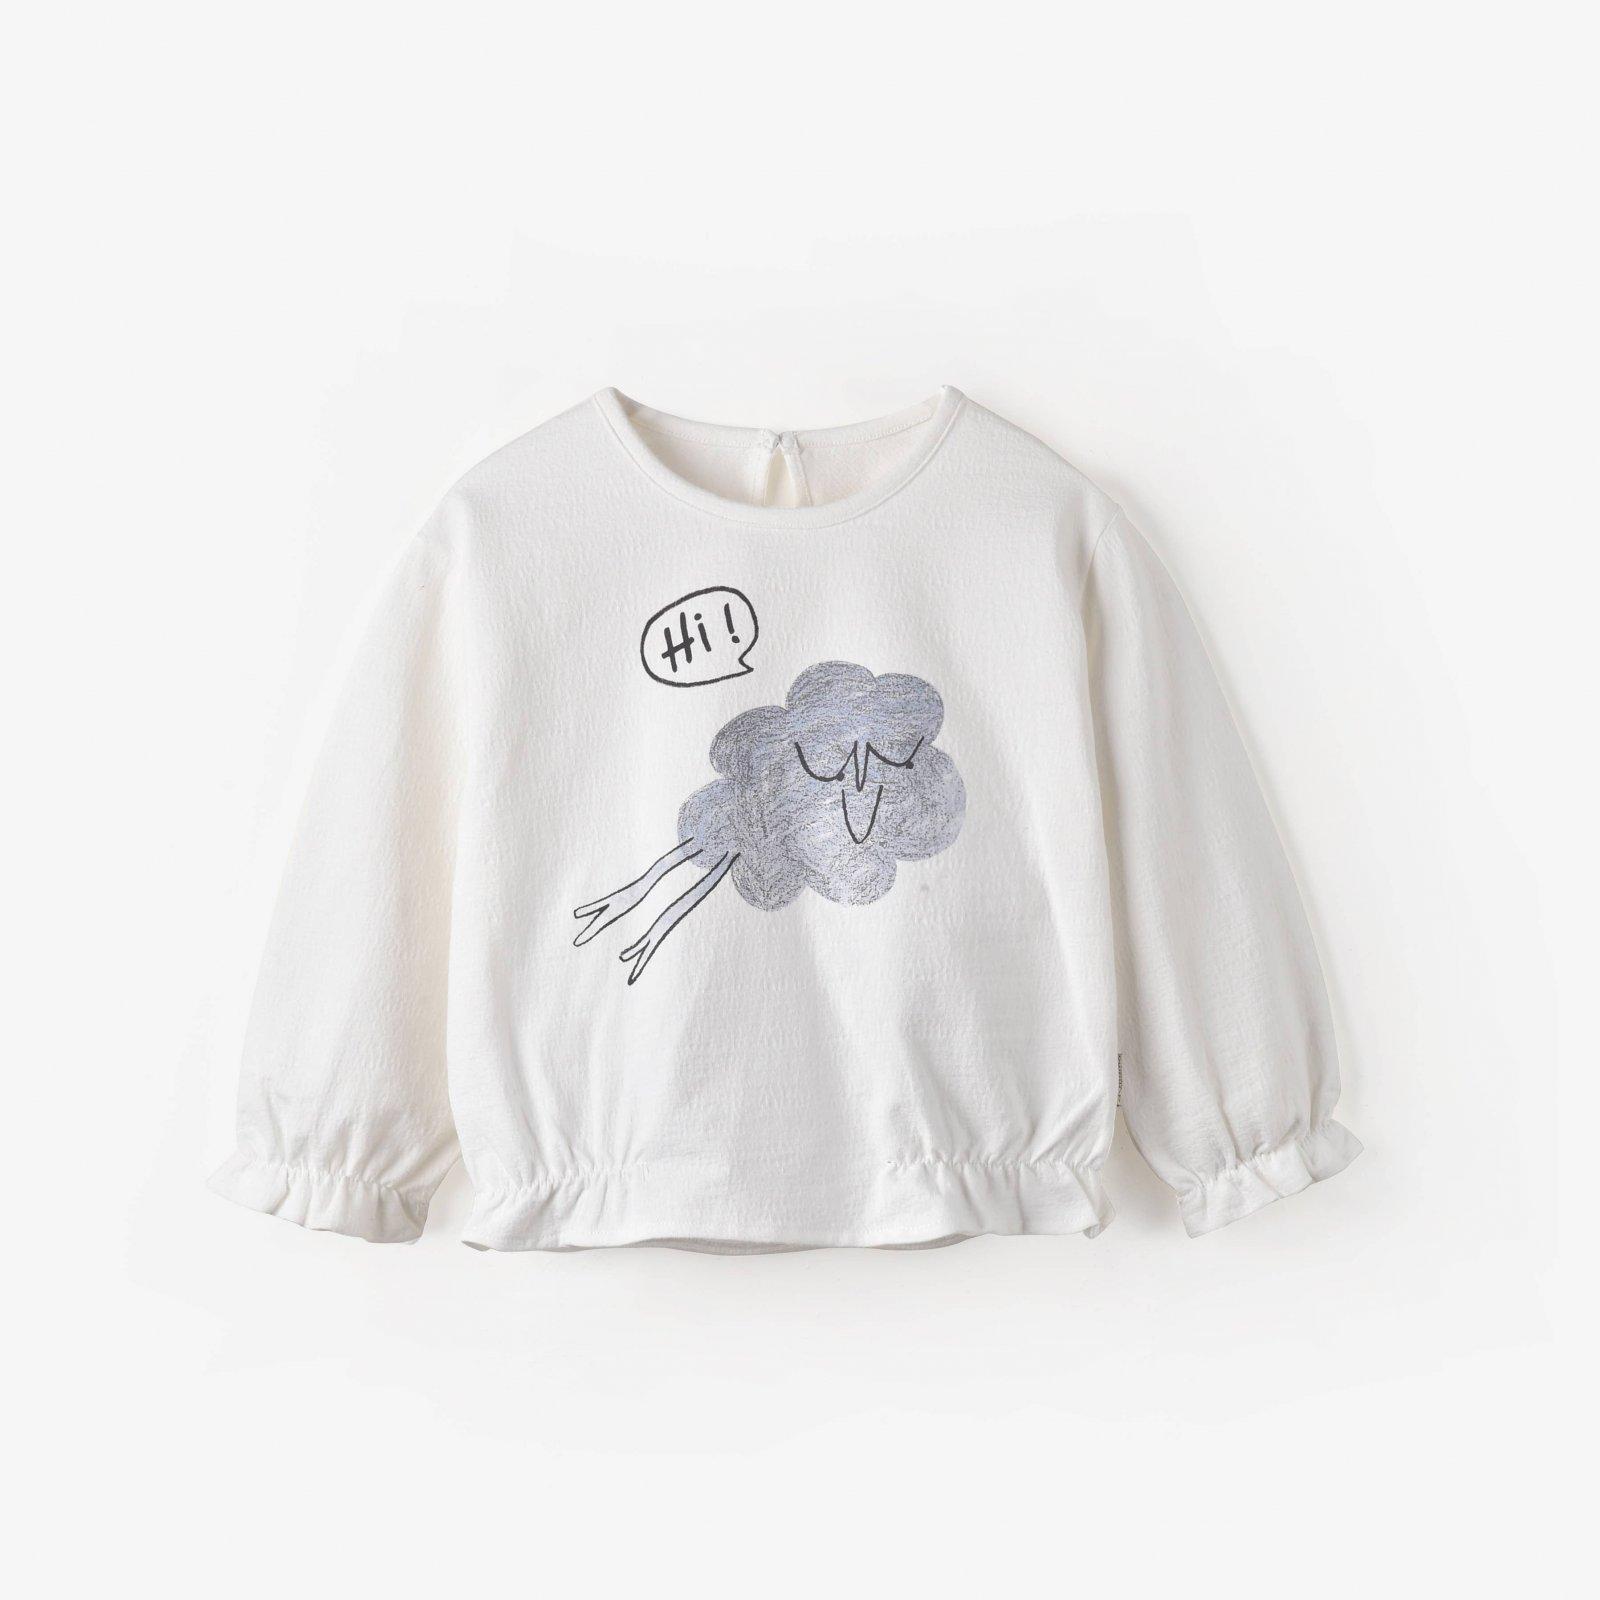 Hieeee Shirt by Aimama